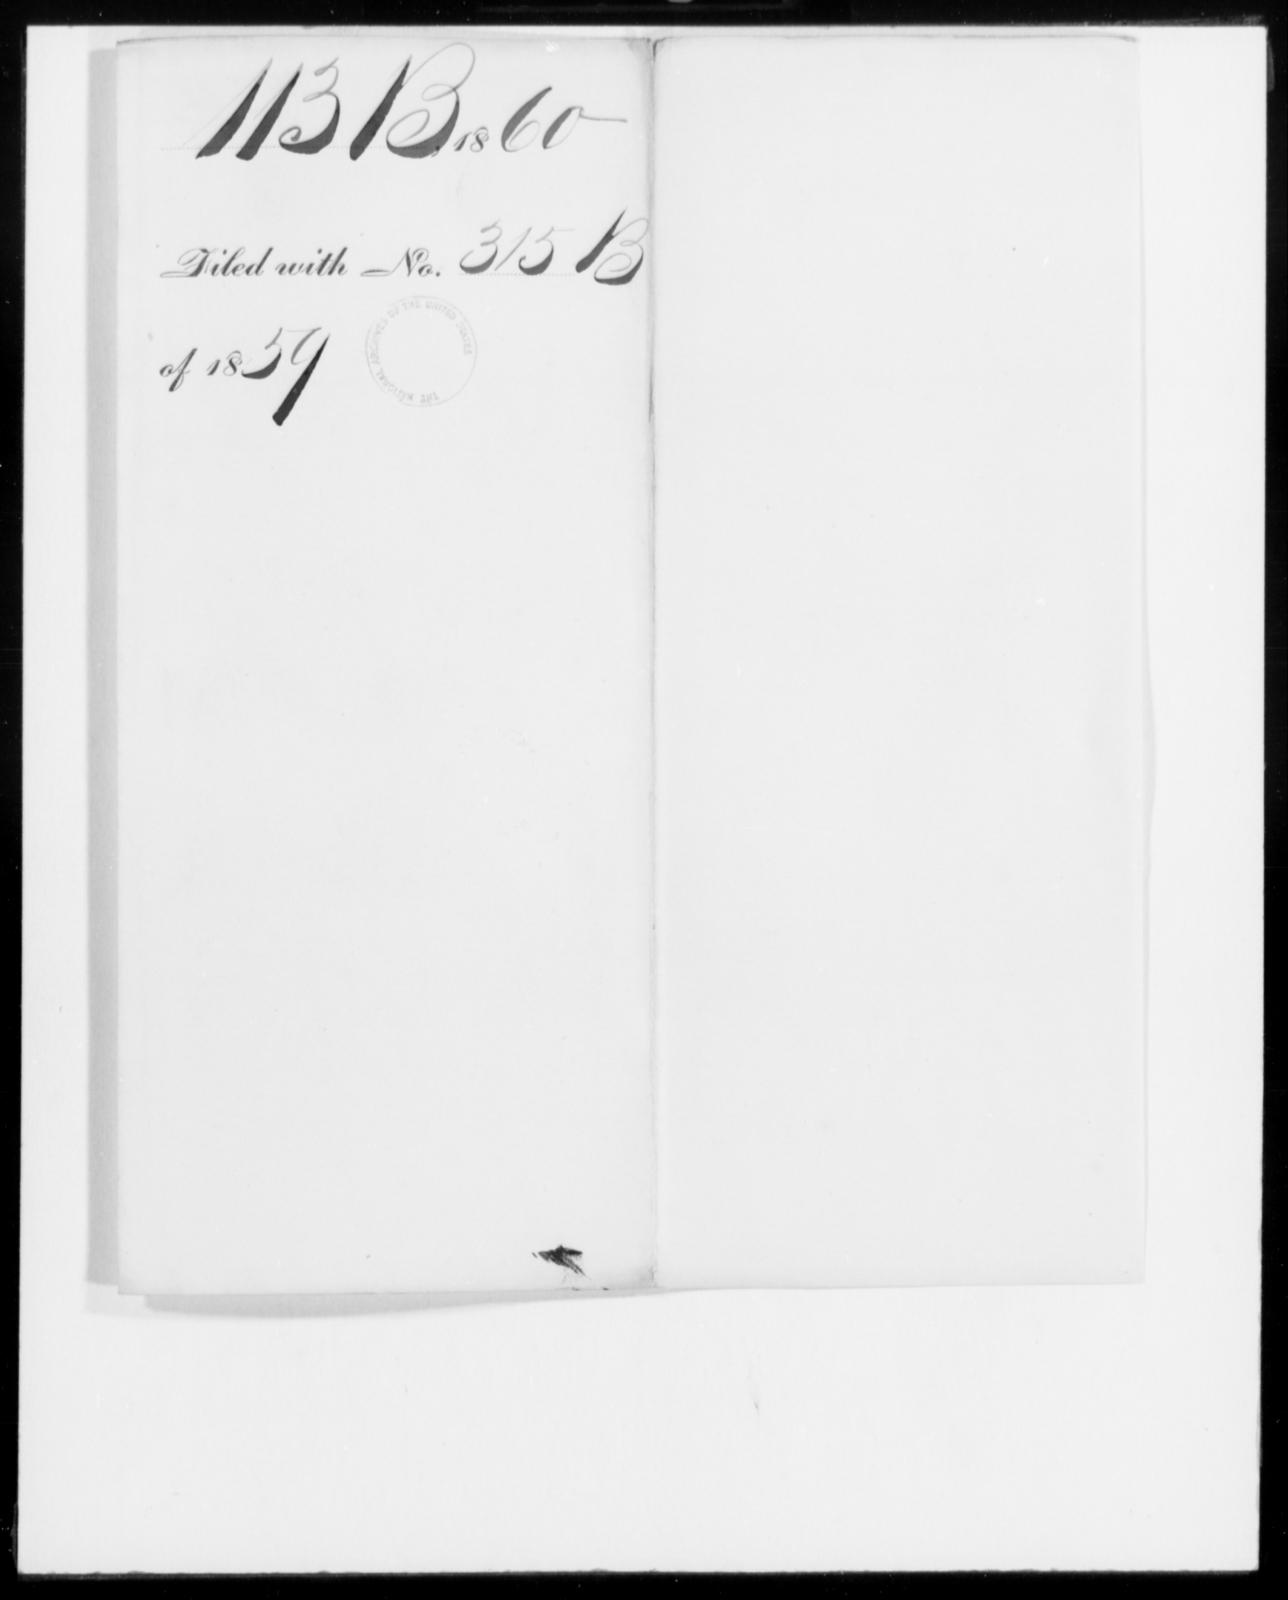 [Blank], [Blank] - State: [Blank] - Year: 1860 - File Number: B113